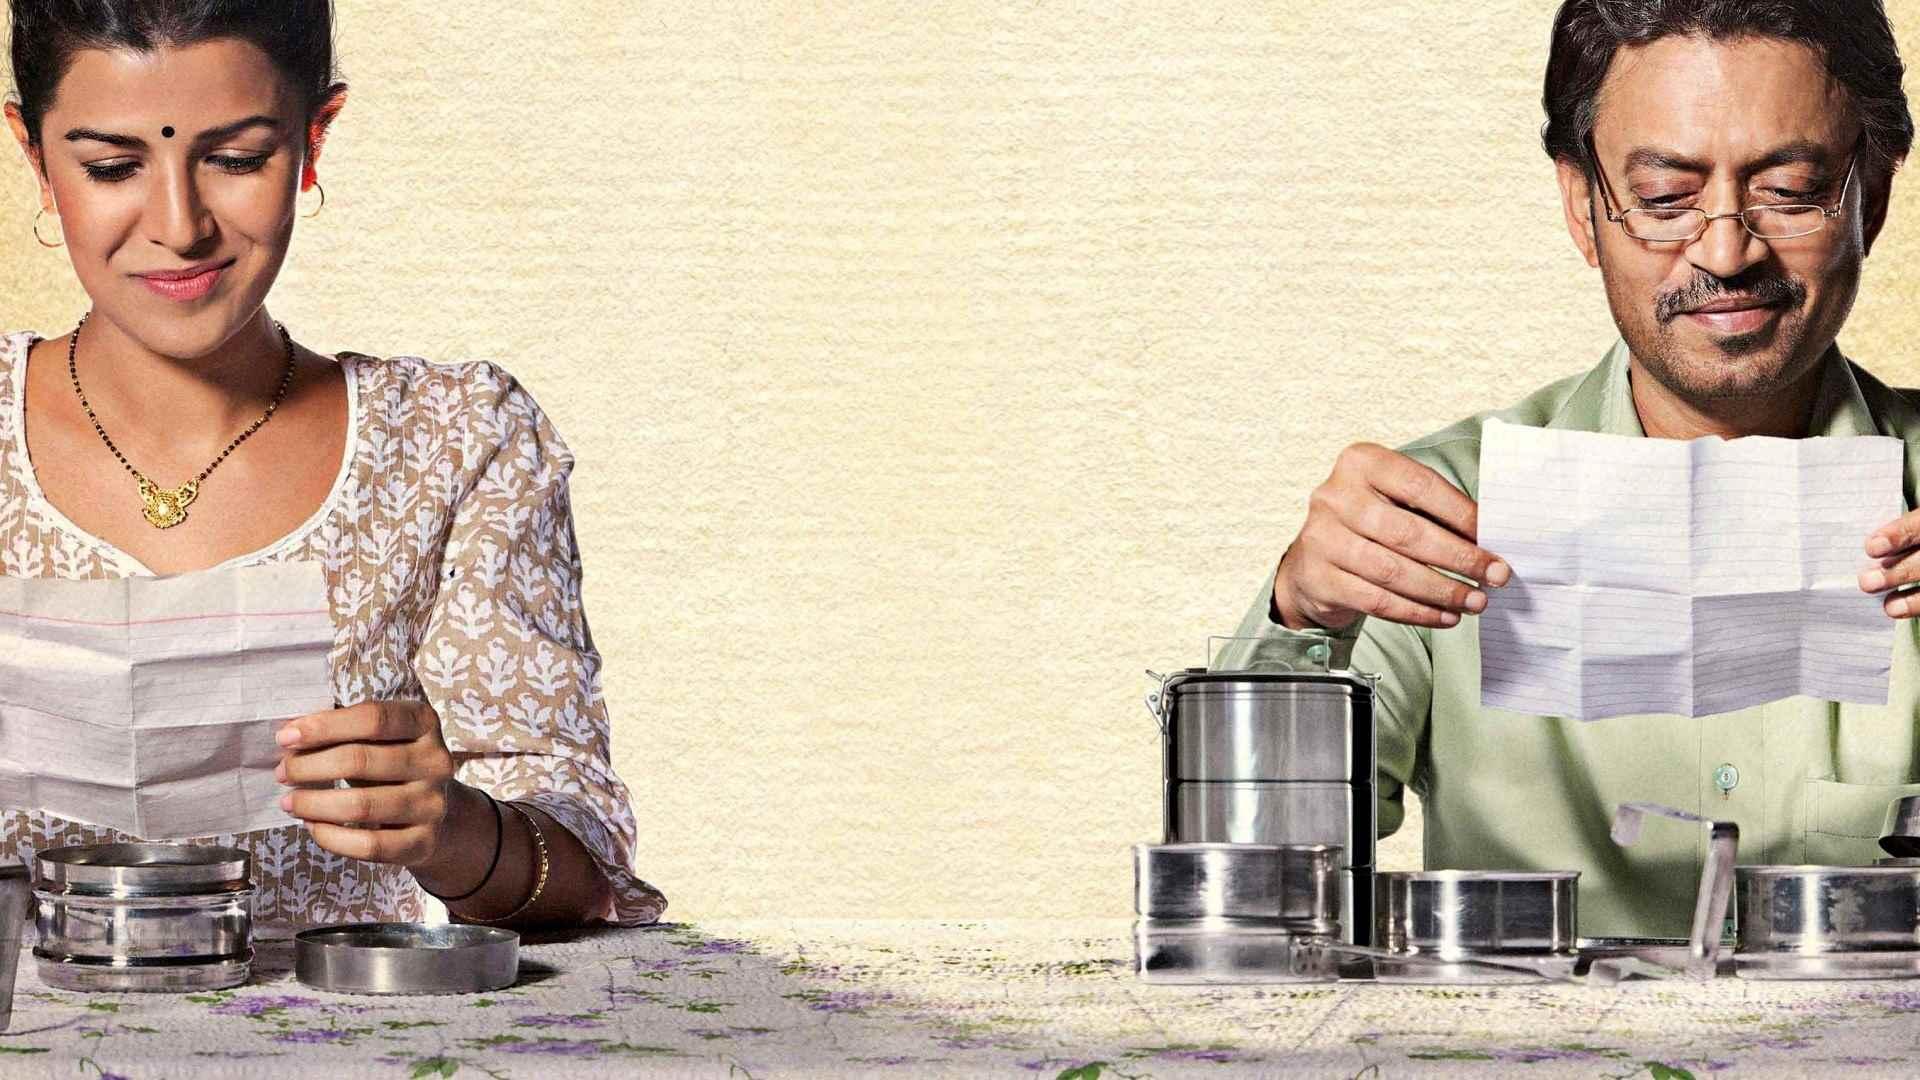 The Lunchbox movie starring Irrfan Khan, Nimrat Kaur and Nawazuddin Siddiqui